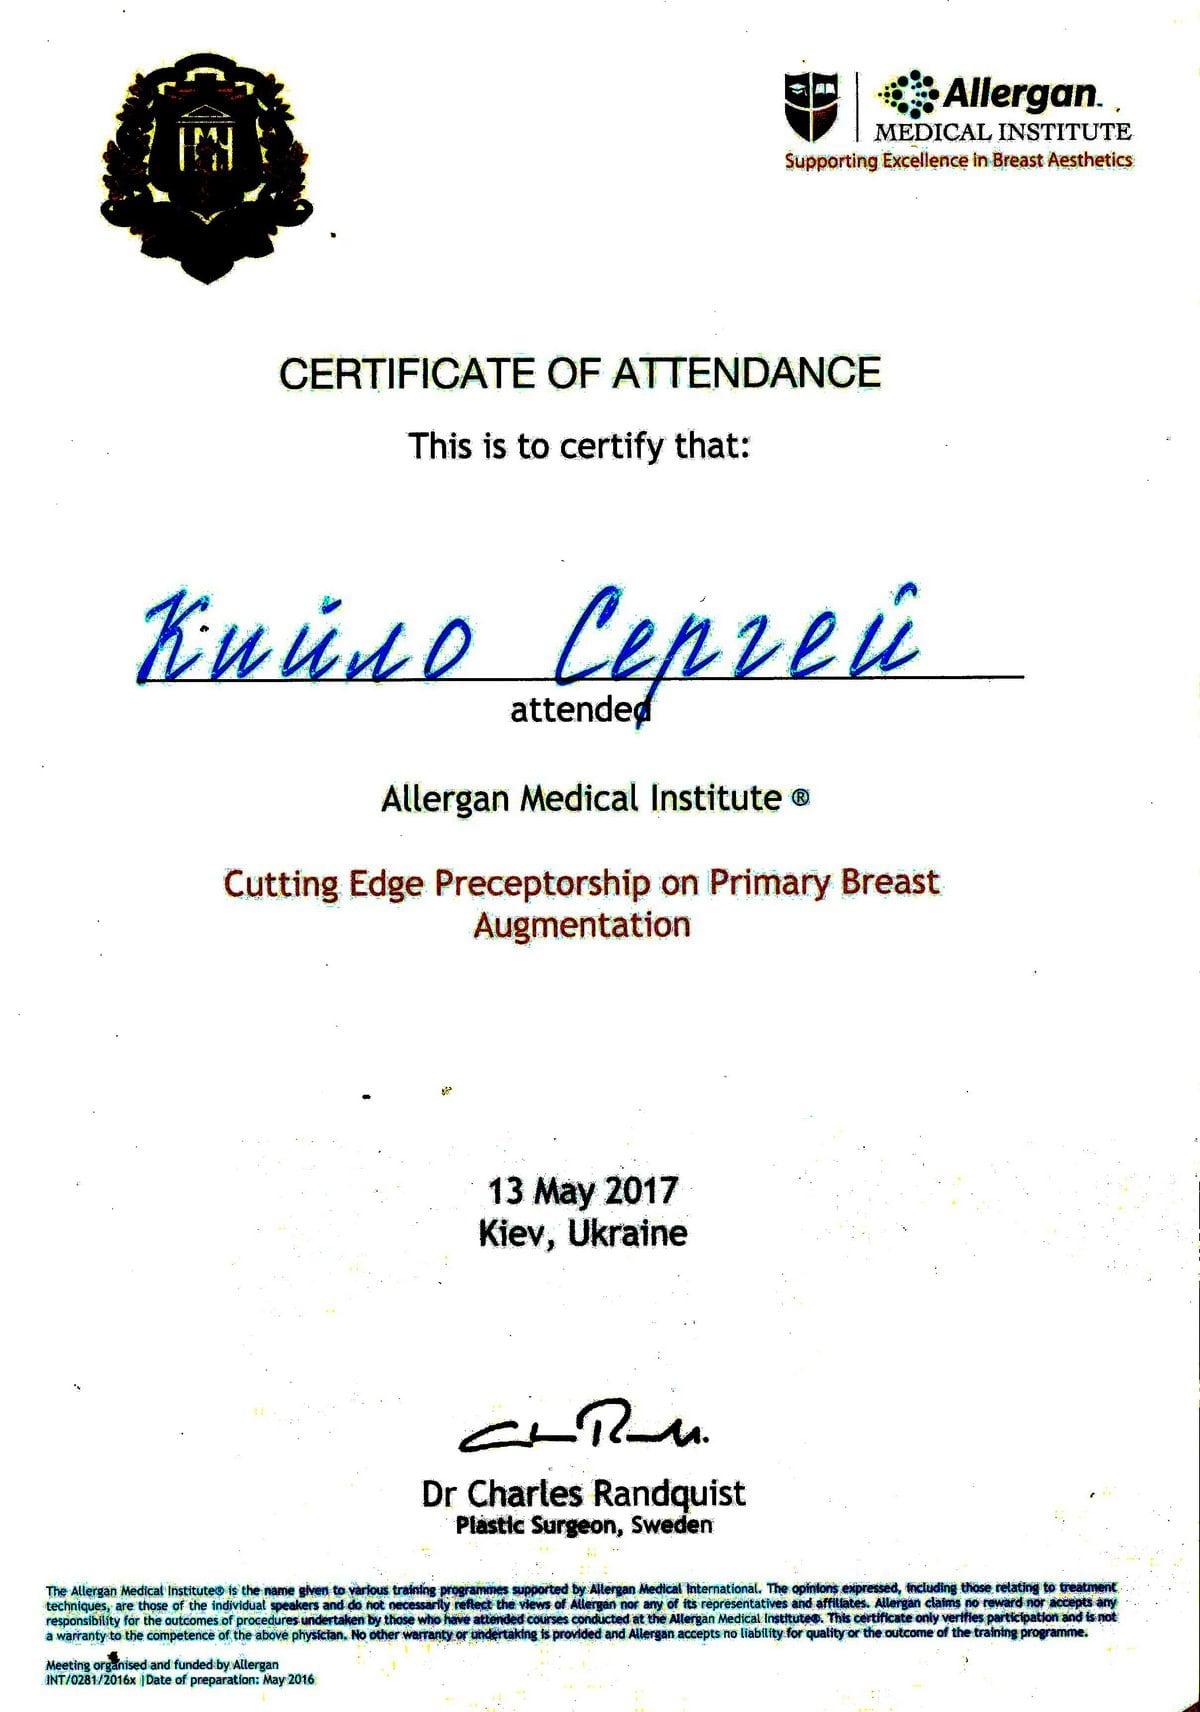 Документ №:29 Сертификат пластического хирурга Кийло Сергея Алексеевича